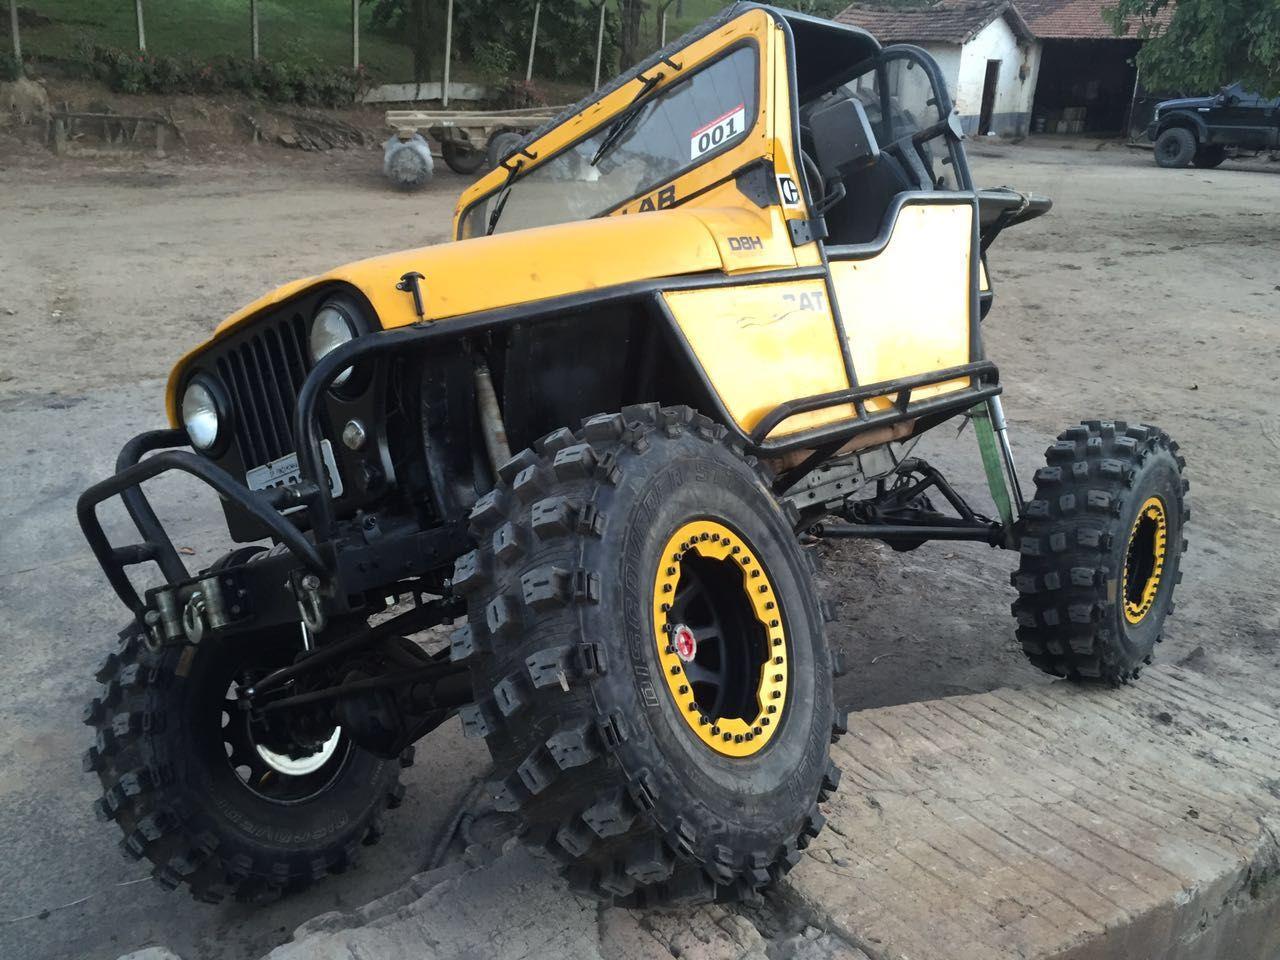 Um Jeep Feito Trator Revista 4x4 Digital Jeep Monster Truck 4x4